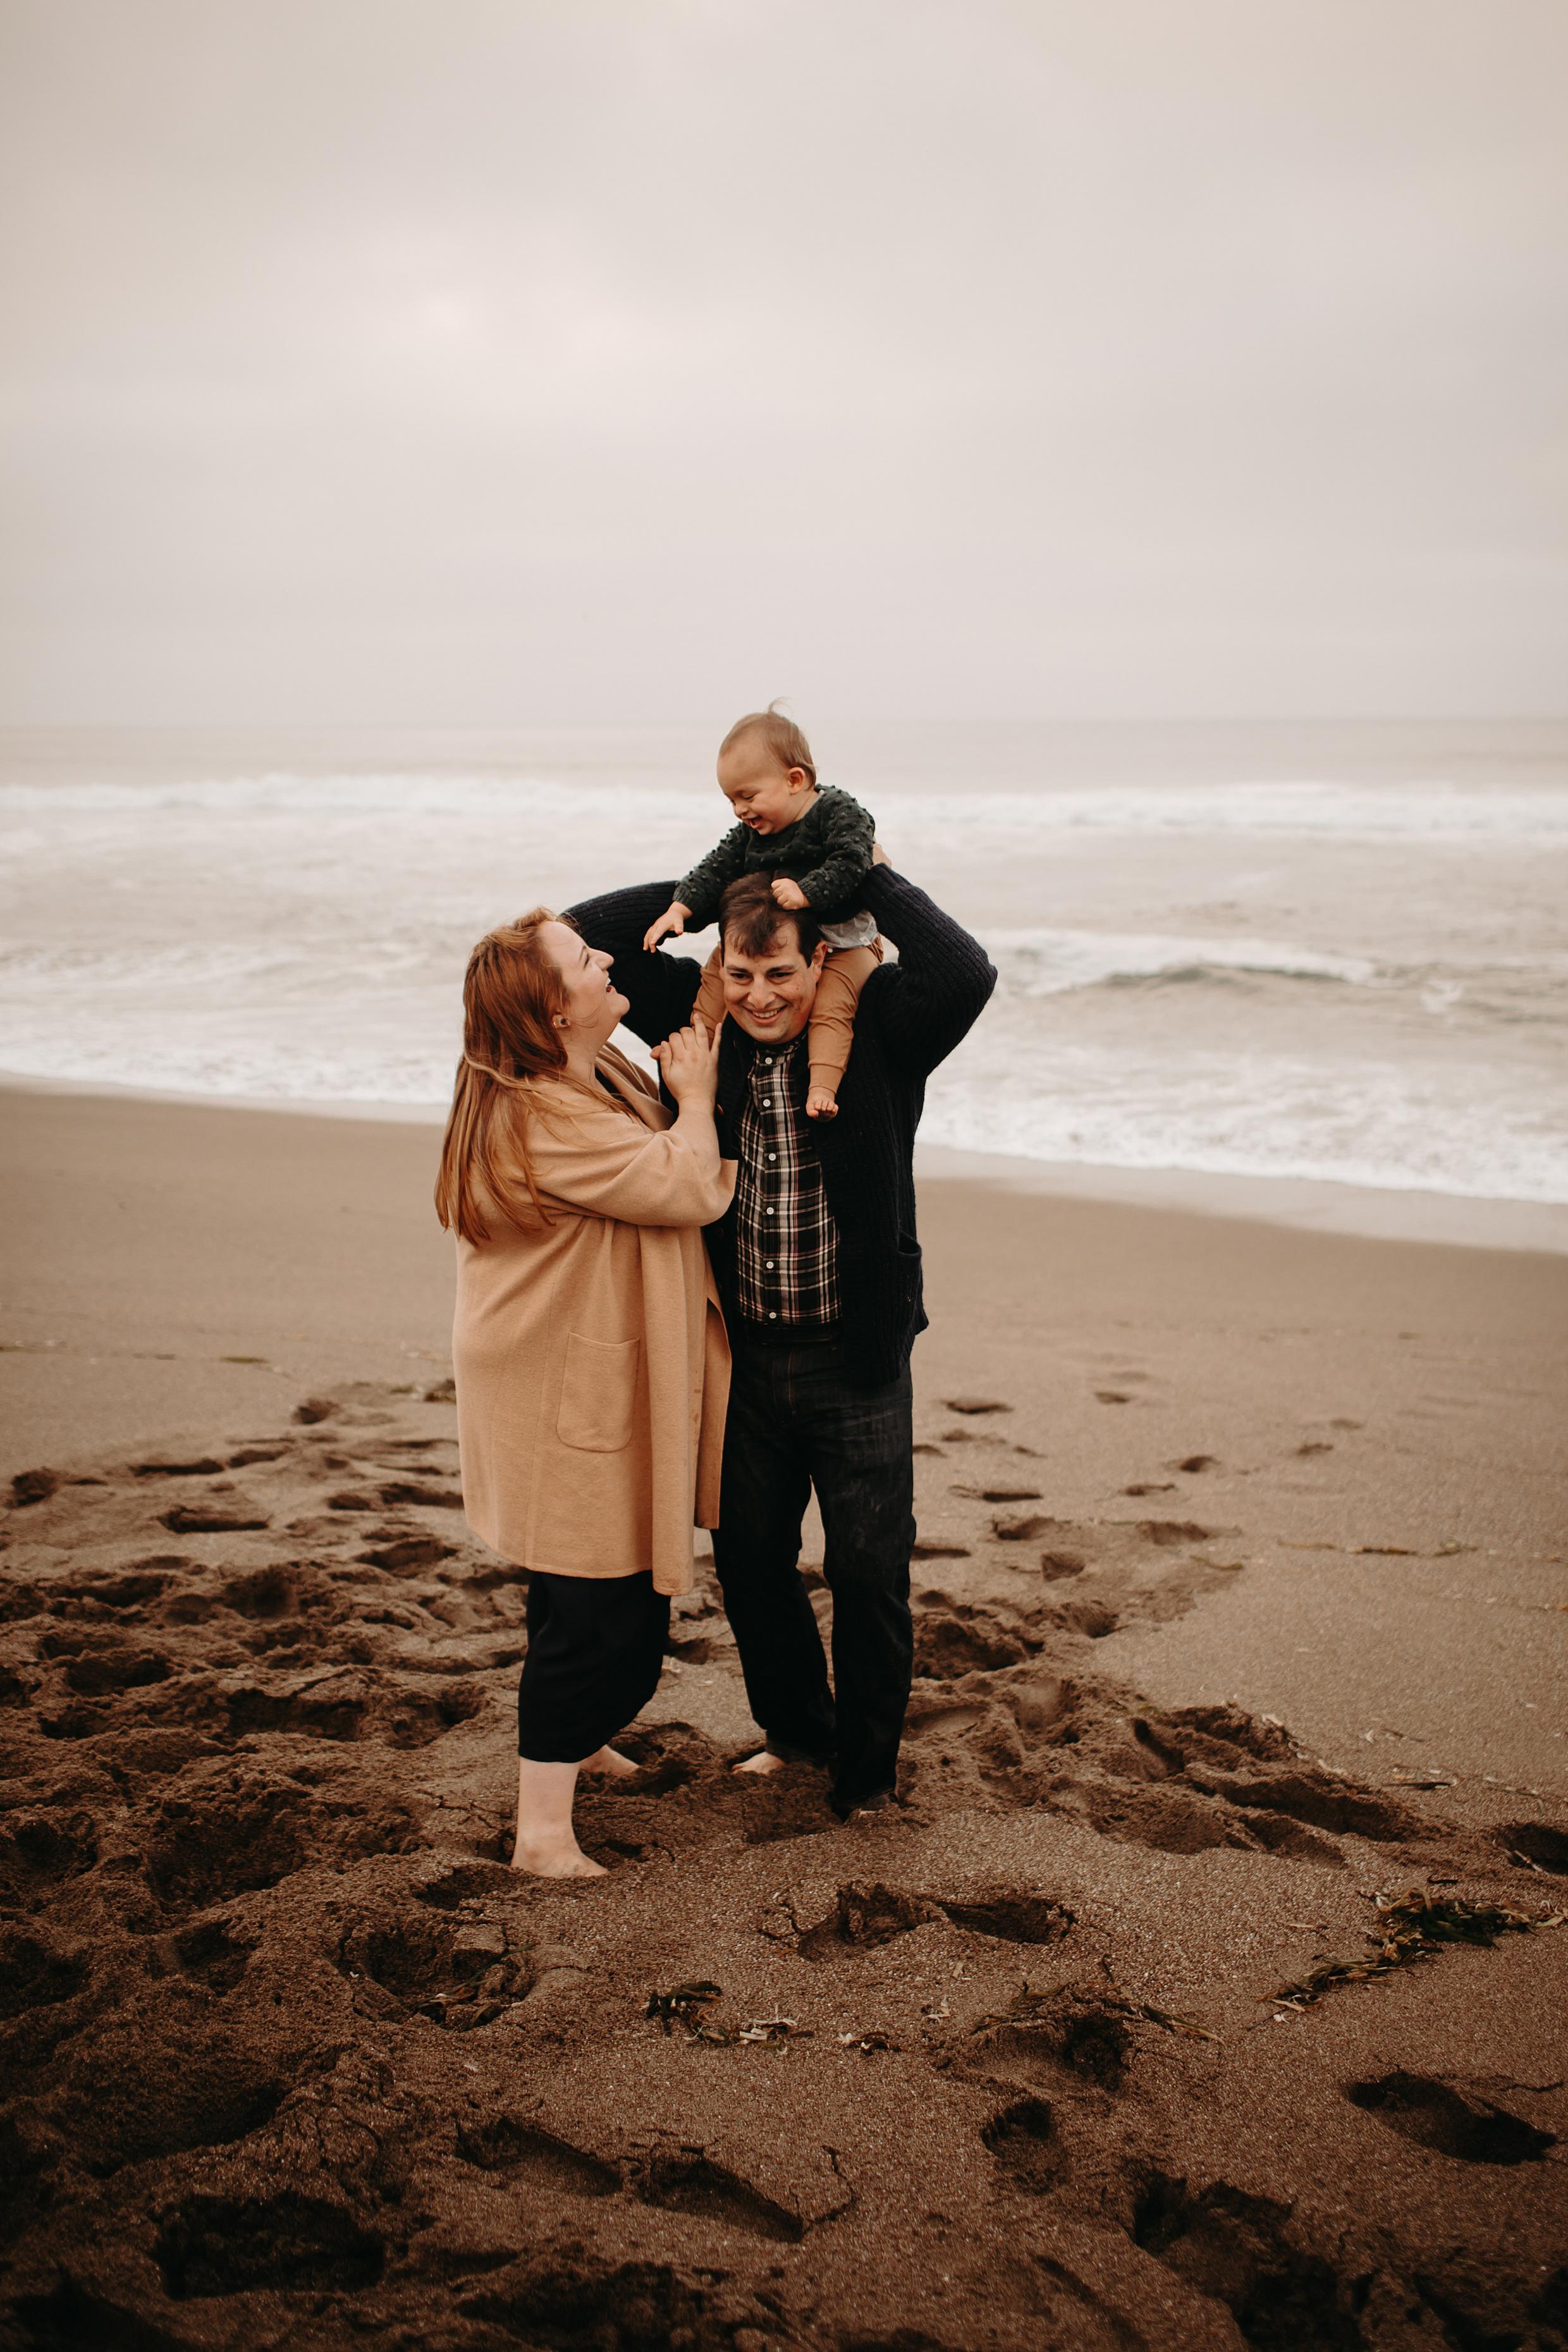 Laurel-San-Antonio-Family-Photographer-77_WEB.jpg